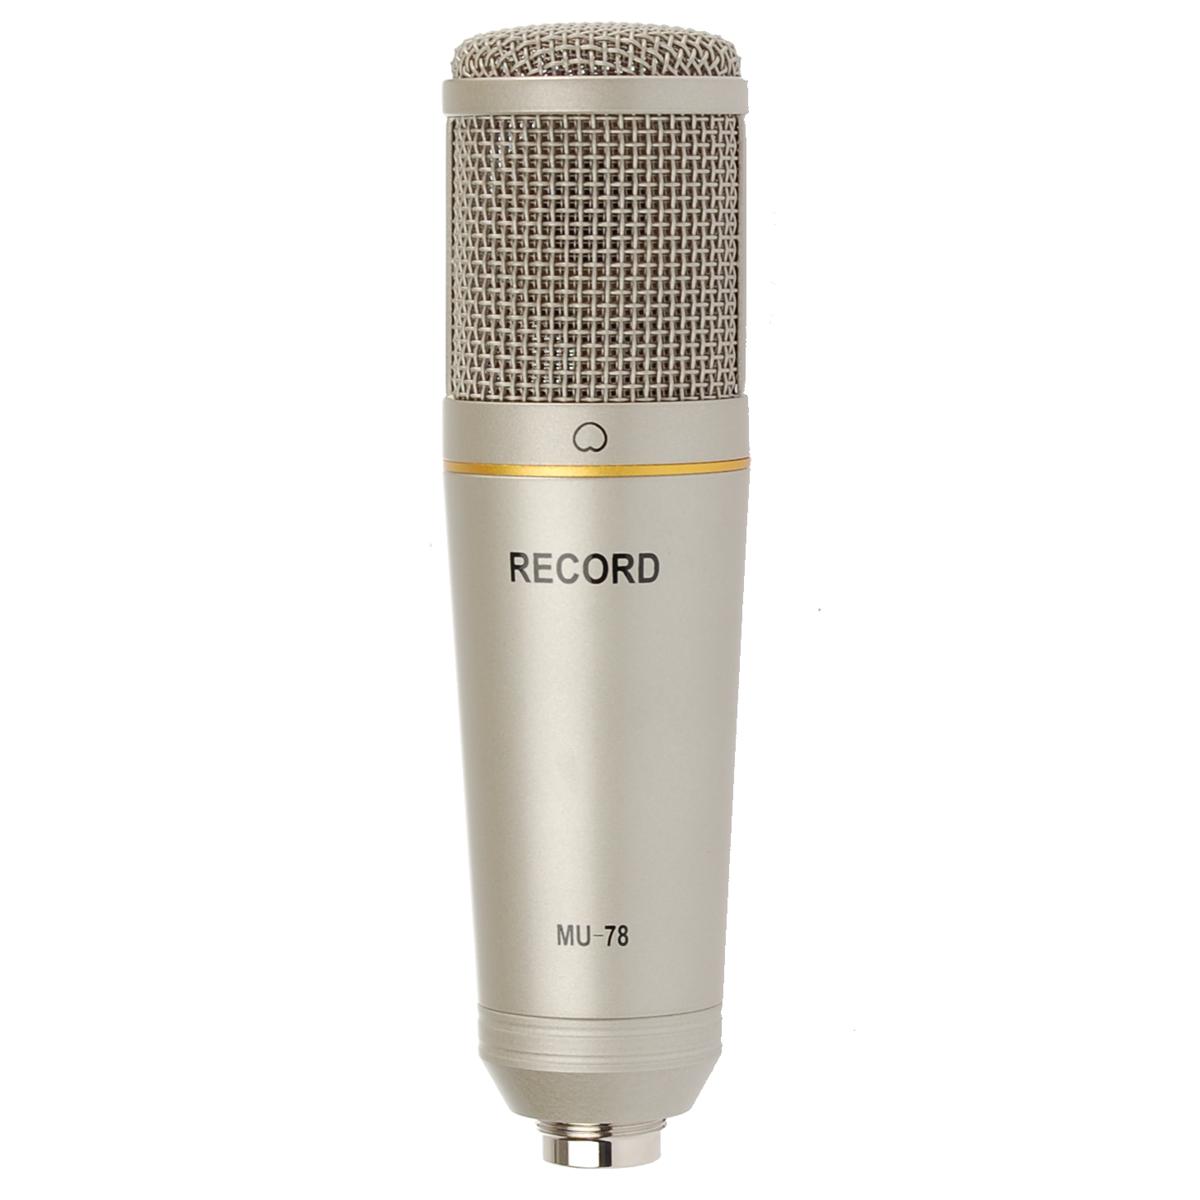 Billede af Record MU-78 USBkondensator-mikrofon